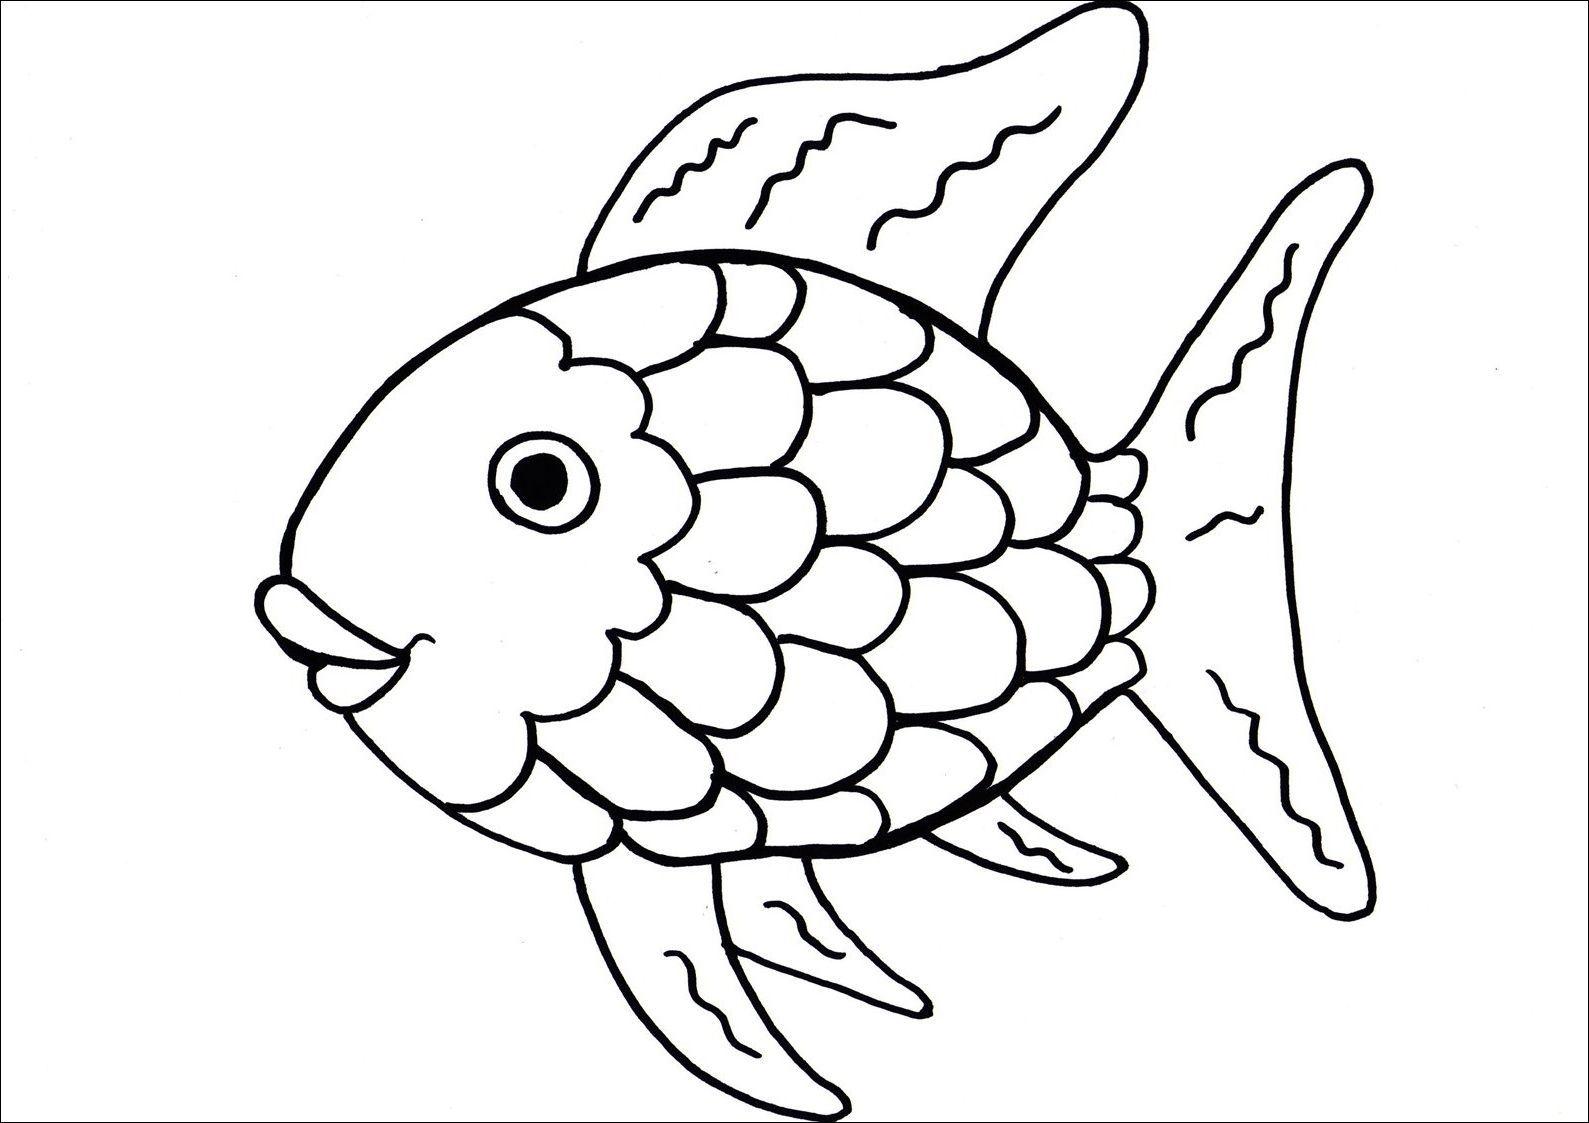 Rainbow Fish Coloring Page #2 | 창조적인 아이디어, 창조적인, 무지개